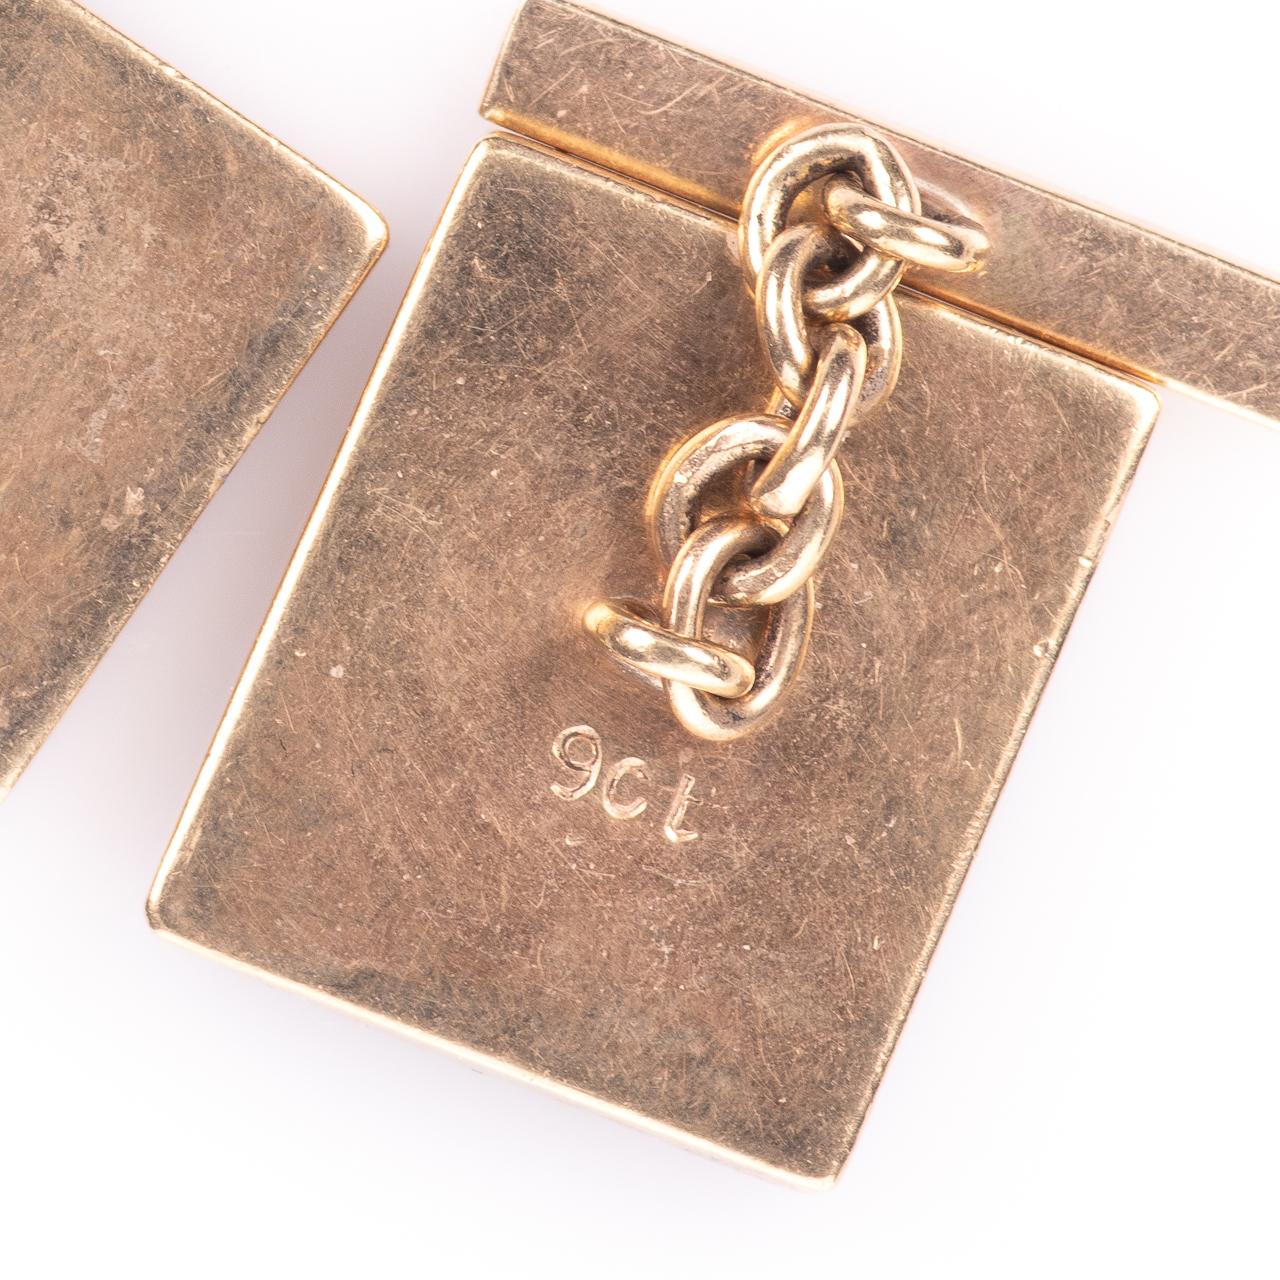 9ct Gold Gentleman's Lapis Lazuli Cufflinks - Image 5 of 5